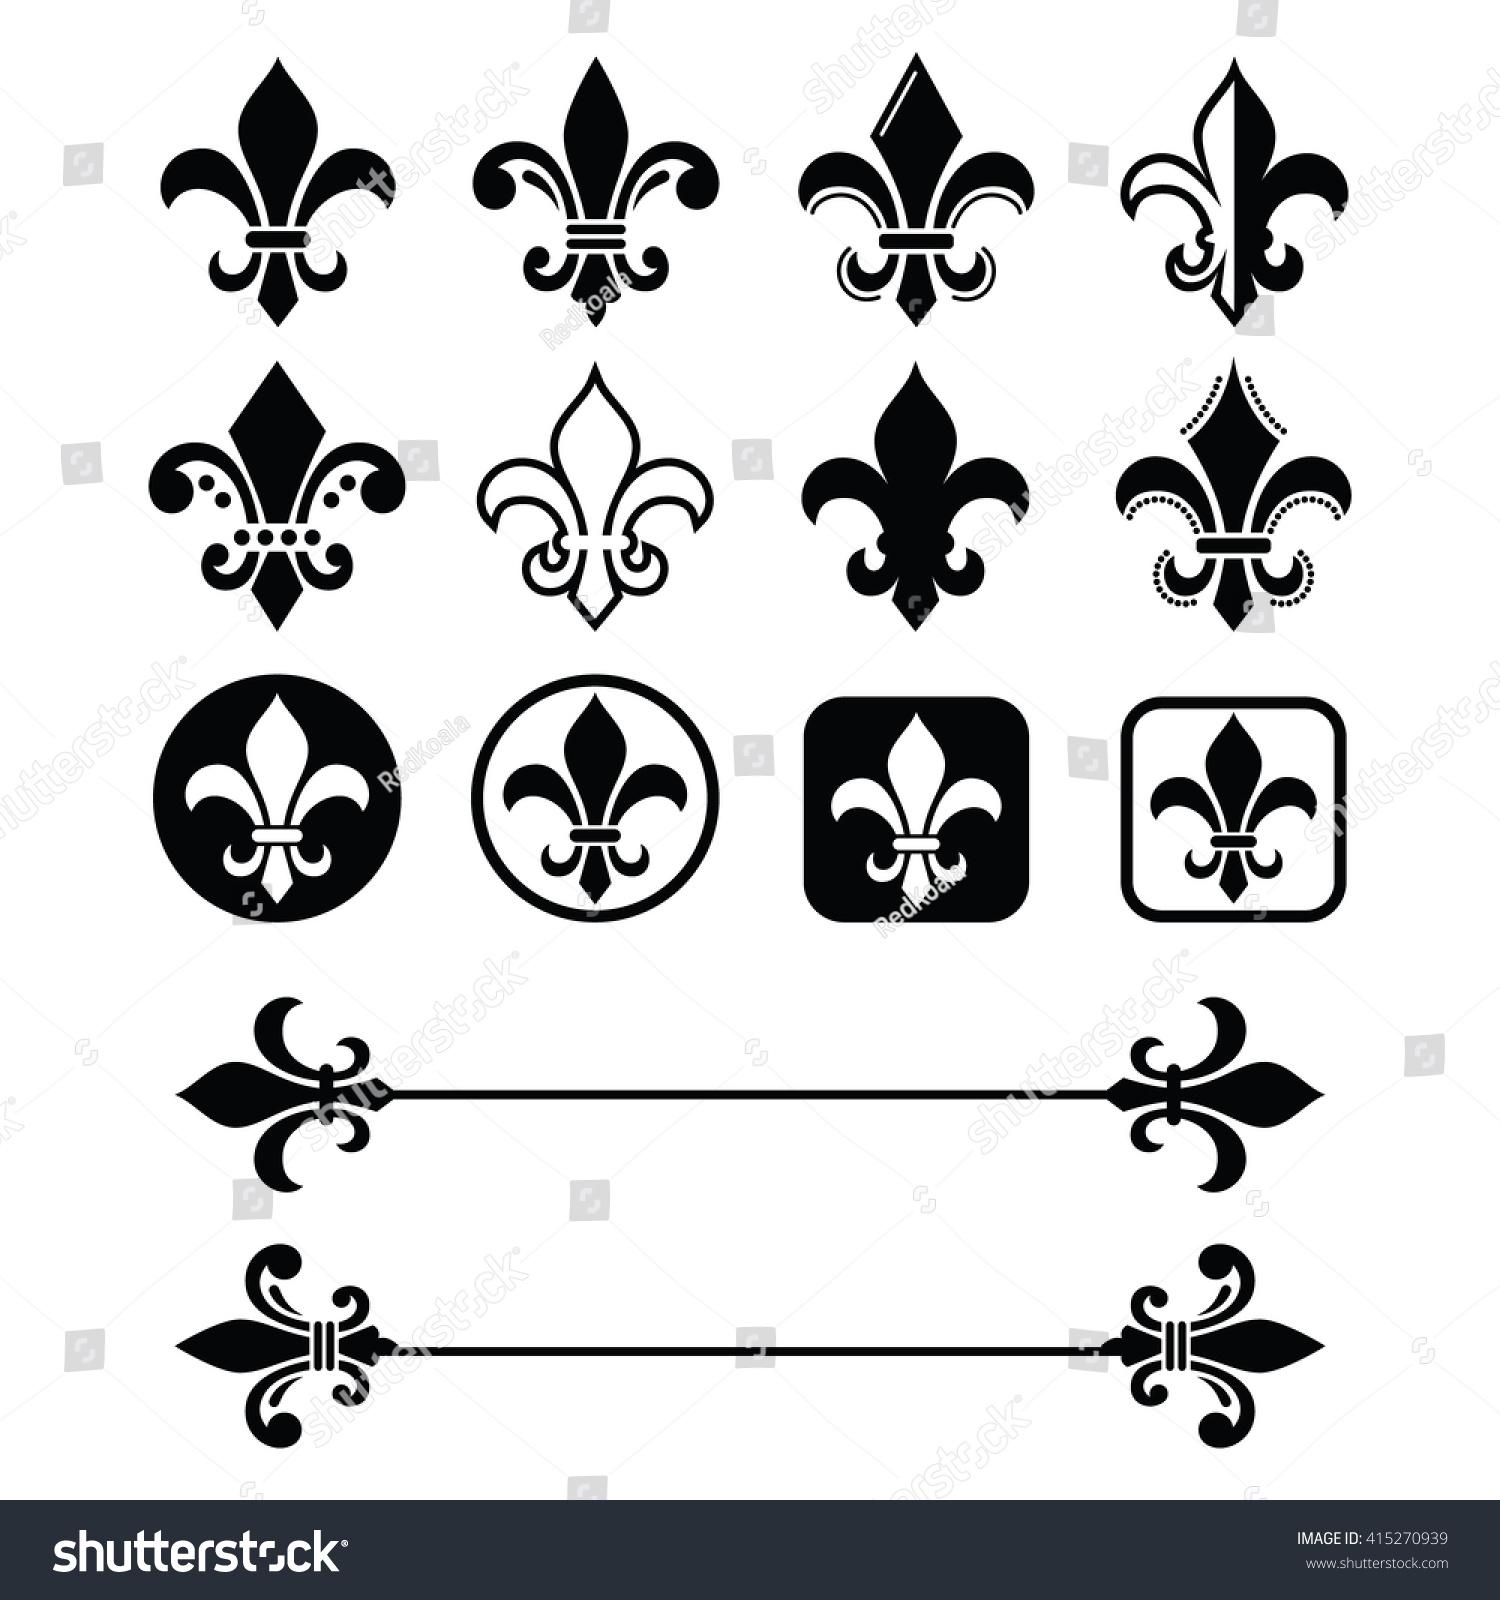 Fleur de lis french symbol design stock vector 415270939 fleur de lis french symbol design scouting organizations french heralry biocorpaavc